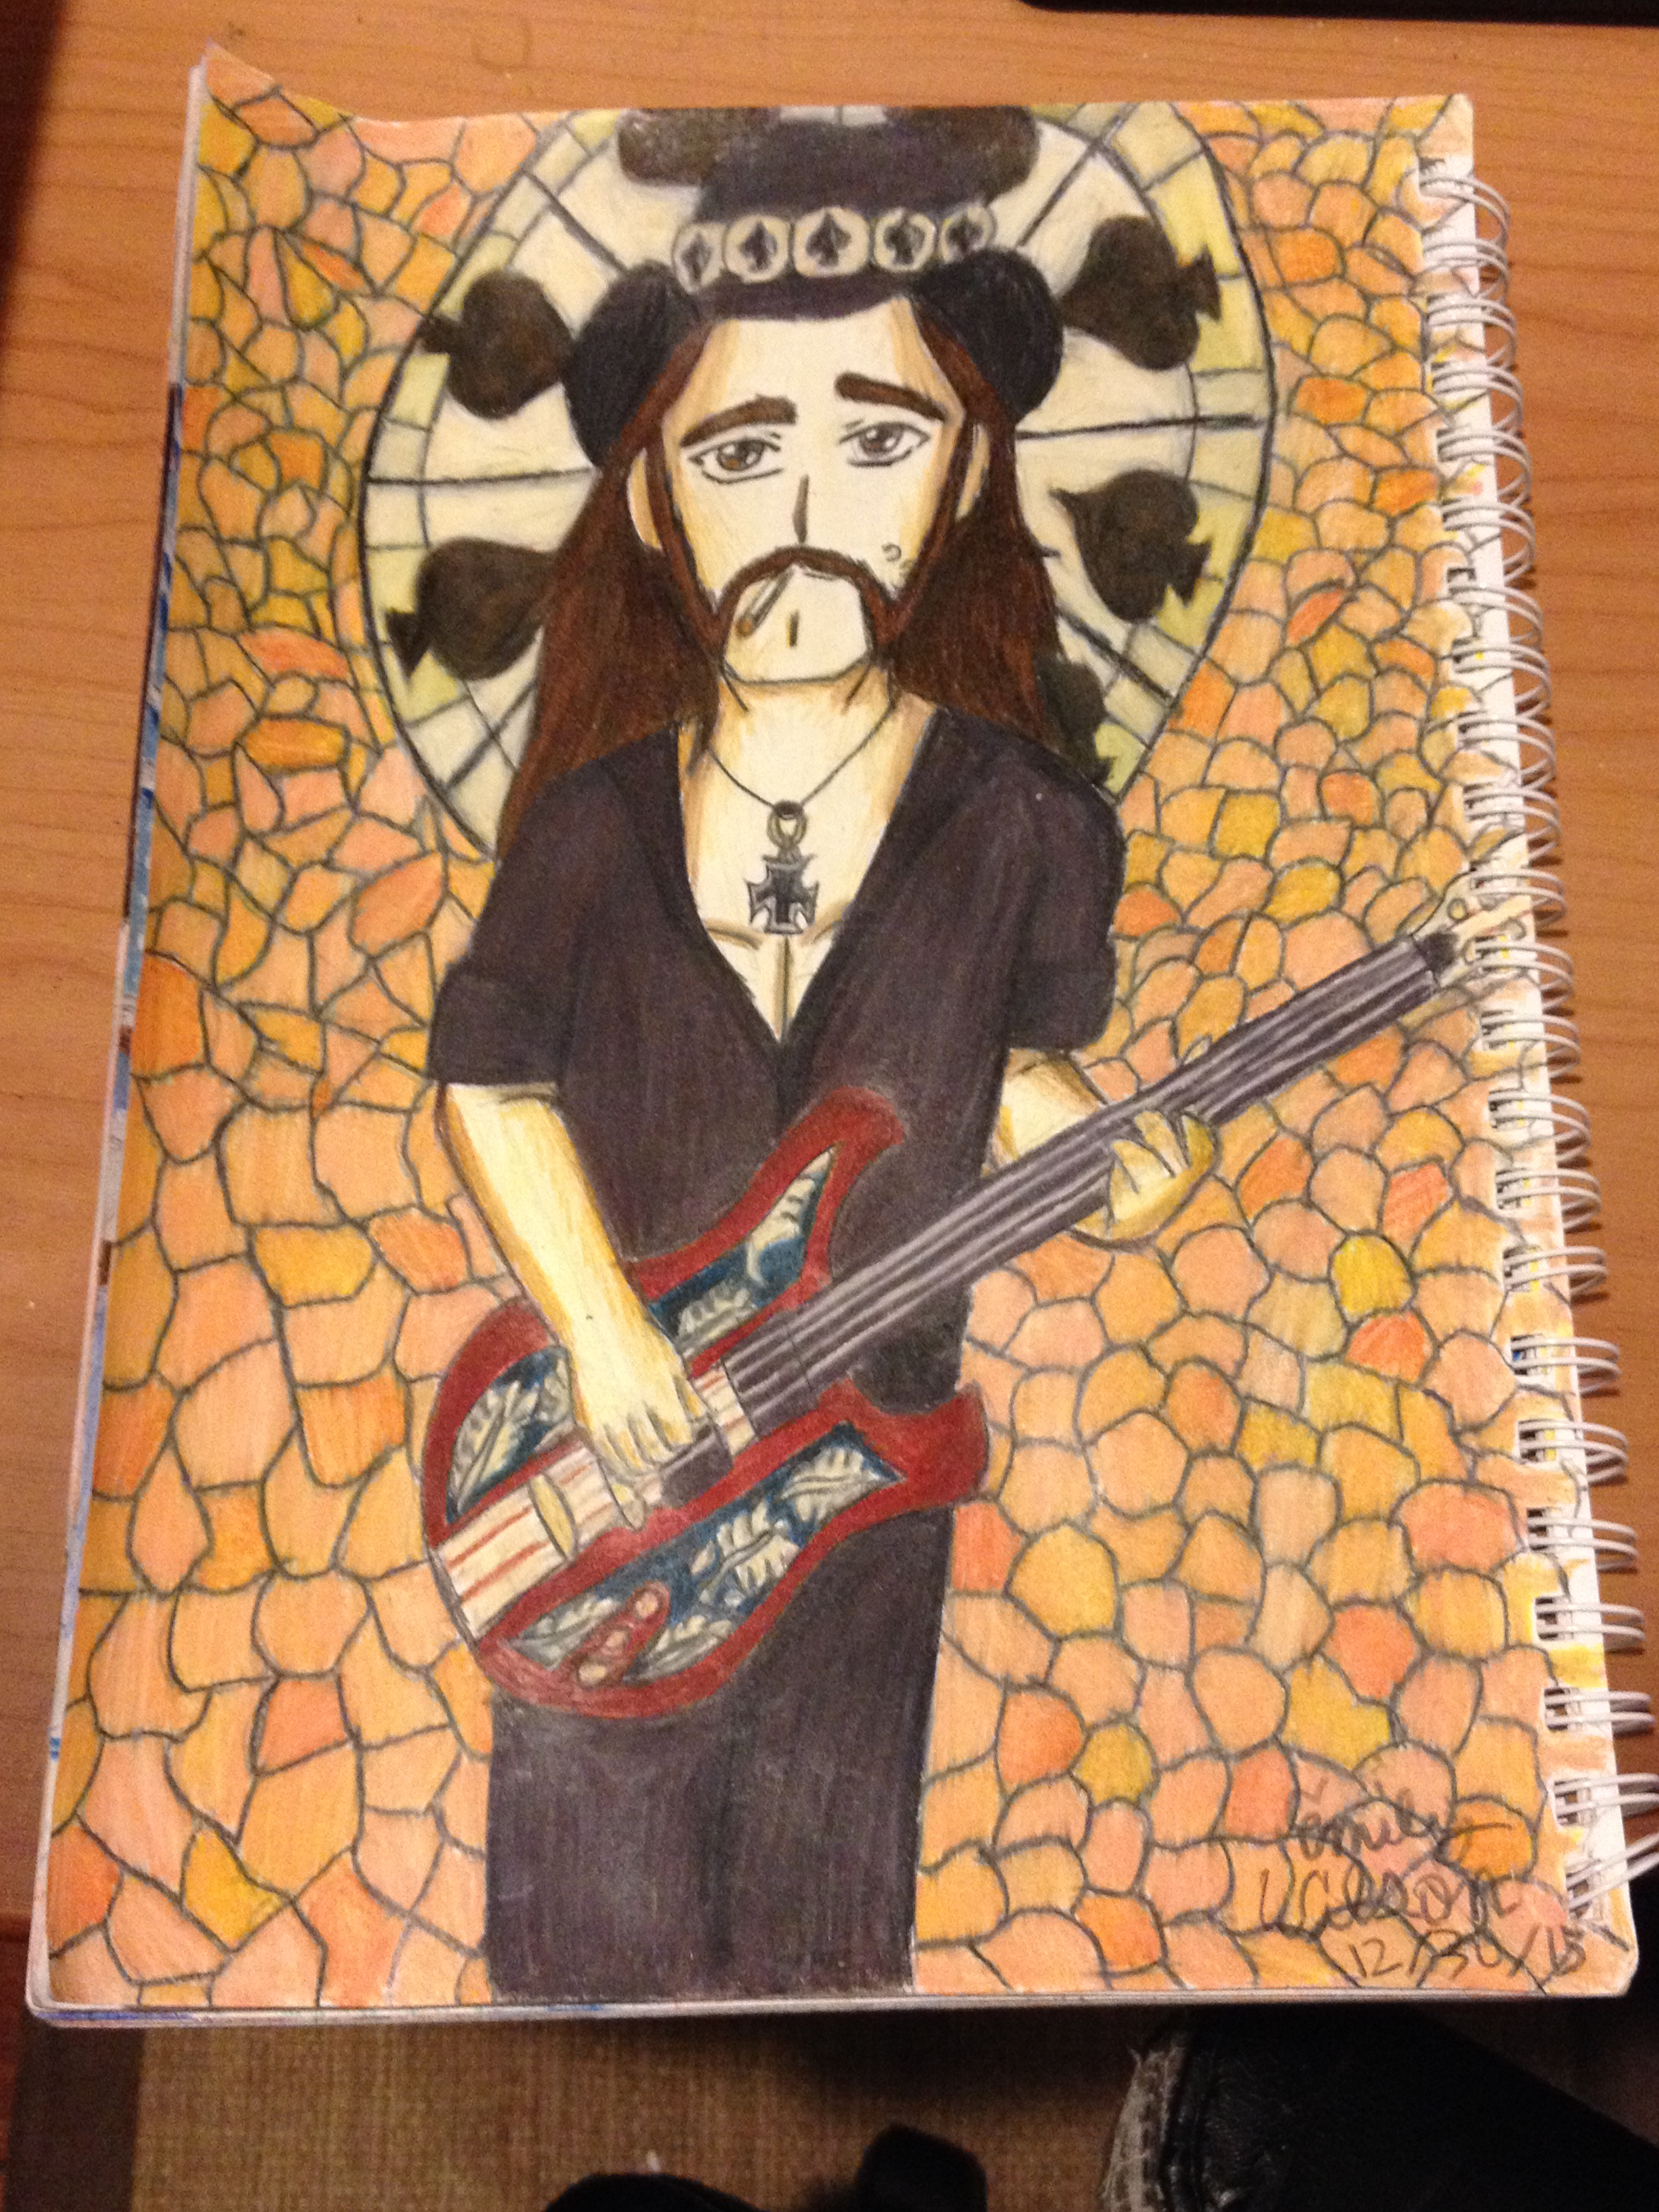 Sketchbook Drawing 21 - Lemmy Kilmister (RIP)